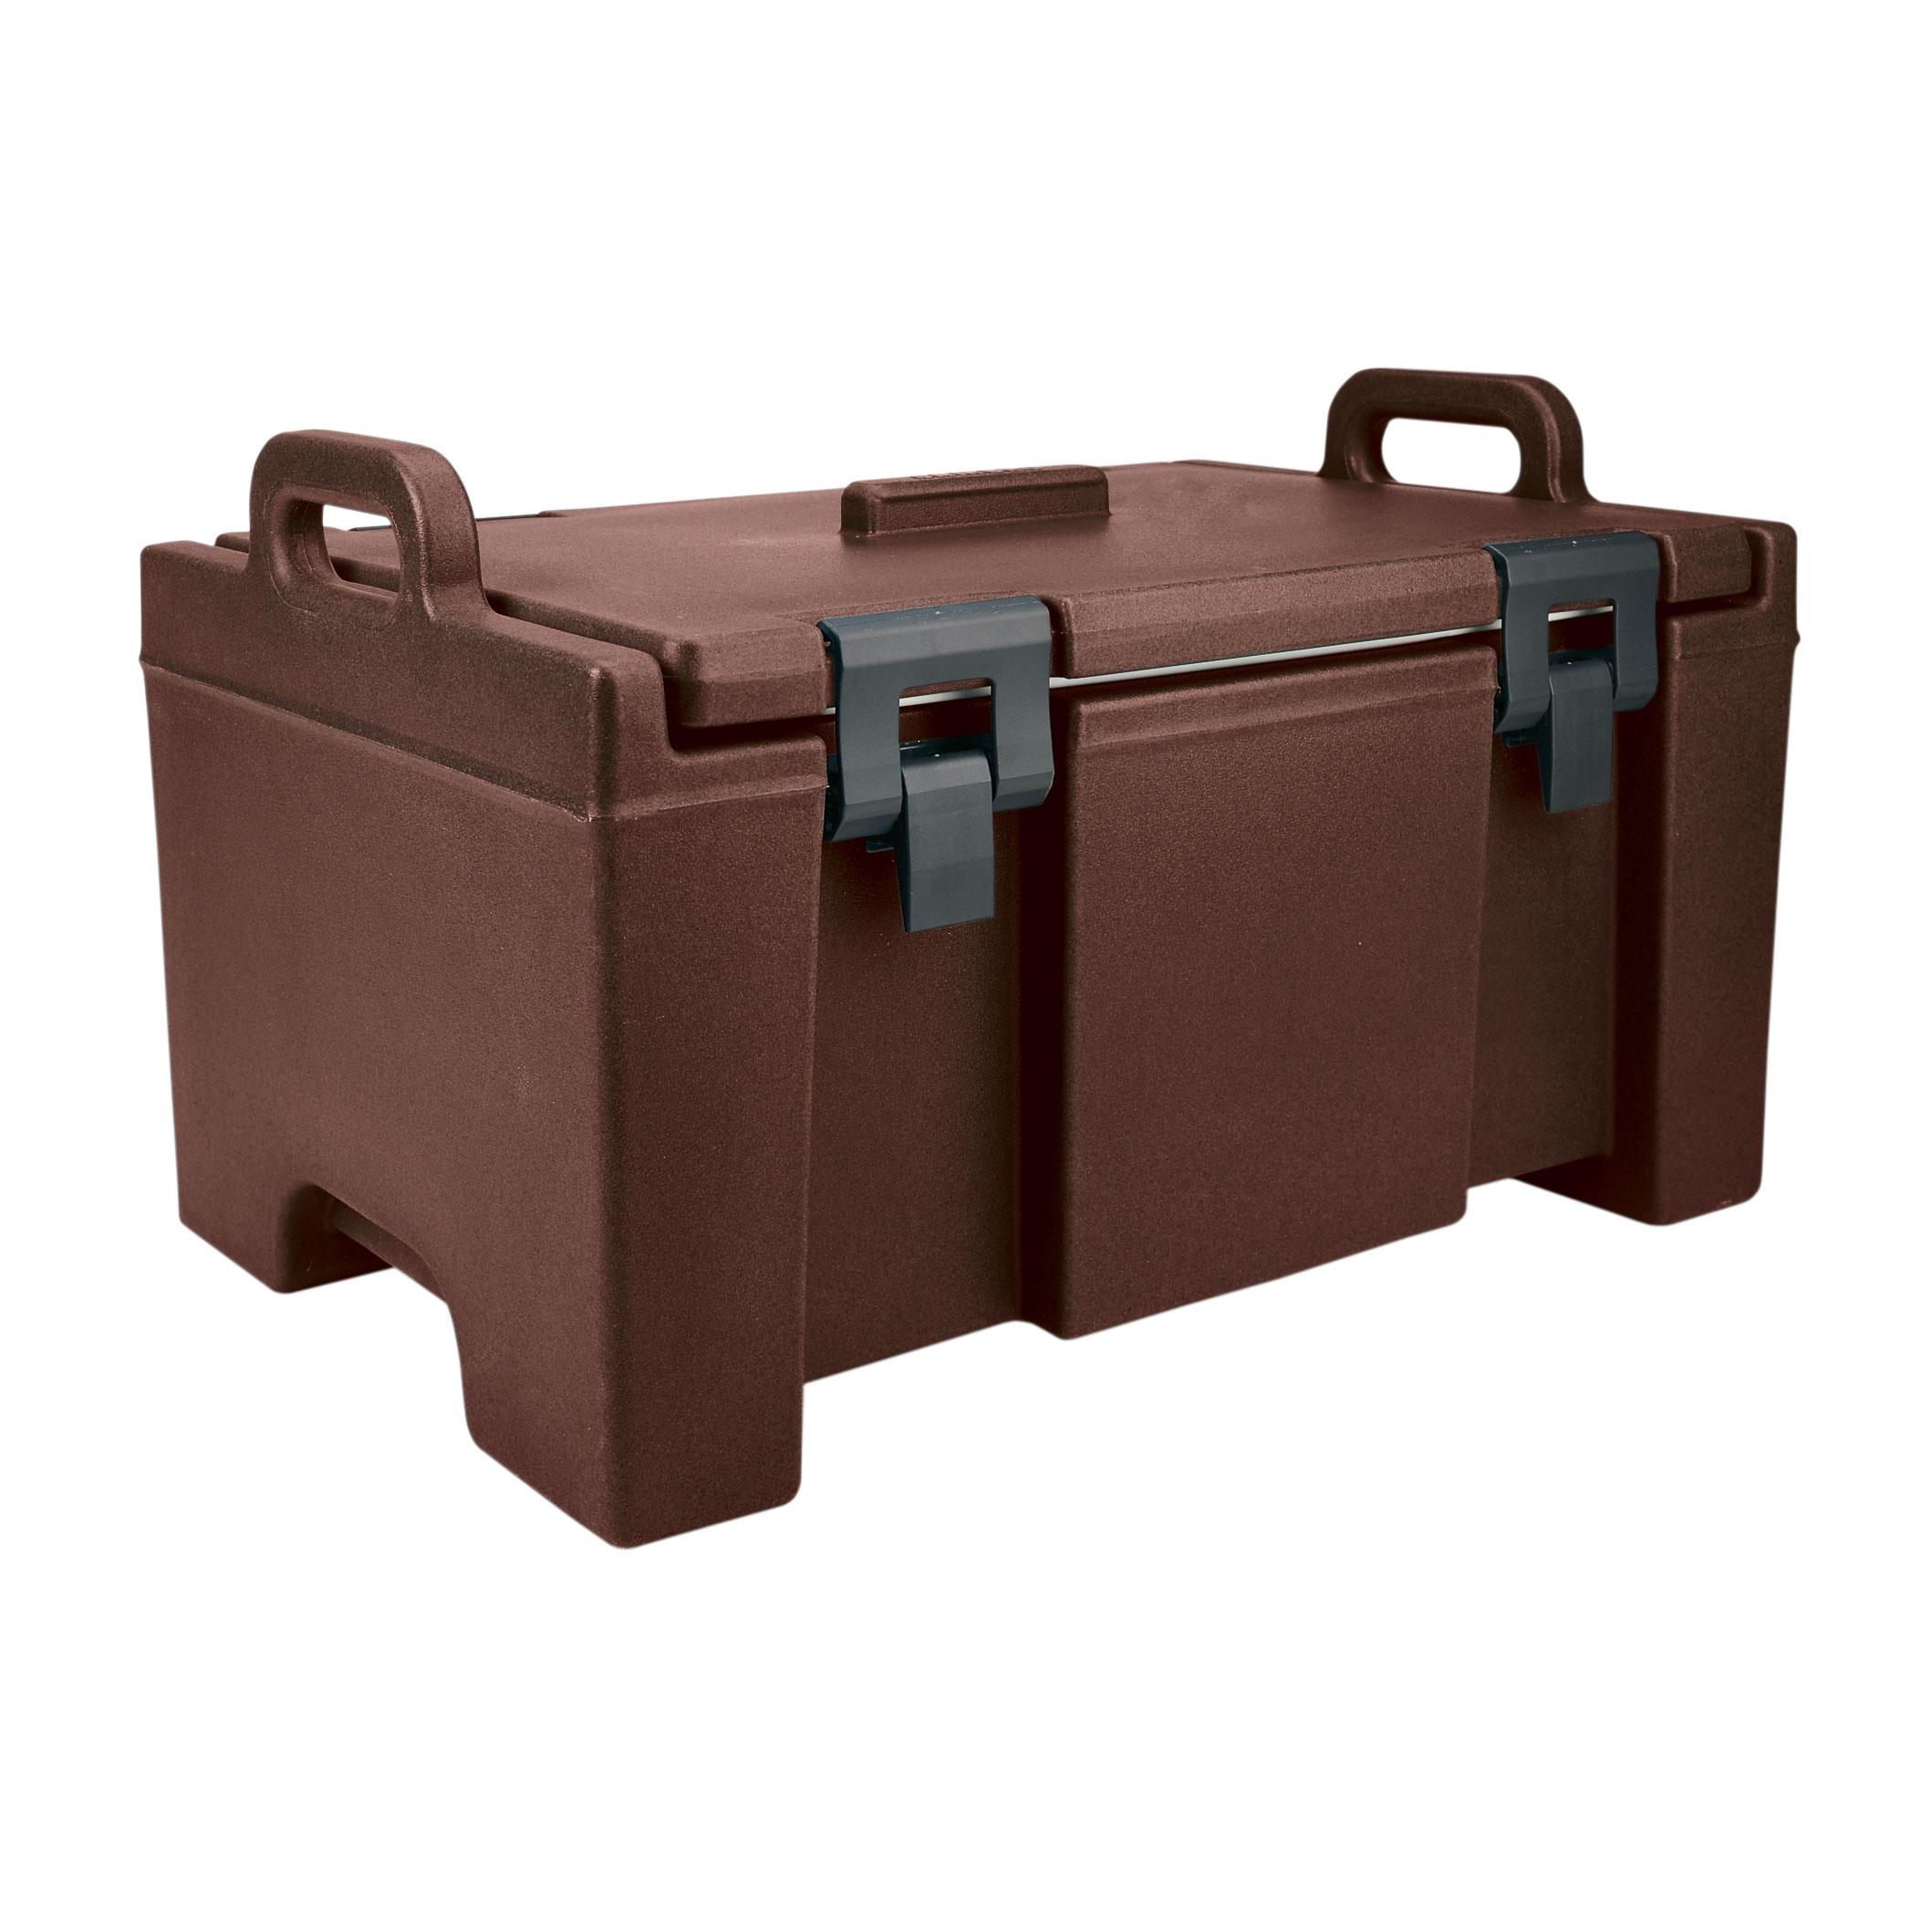 Cambro UPC100131 food pan carriers